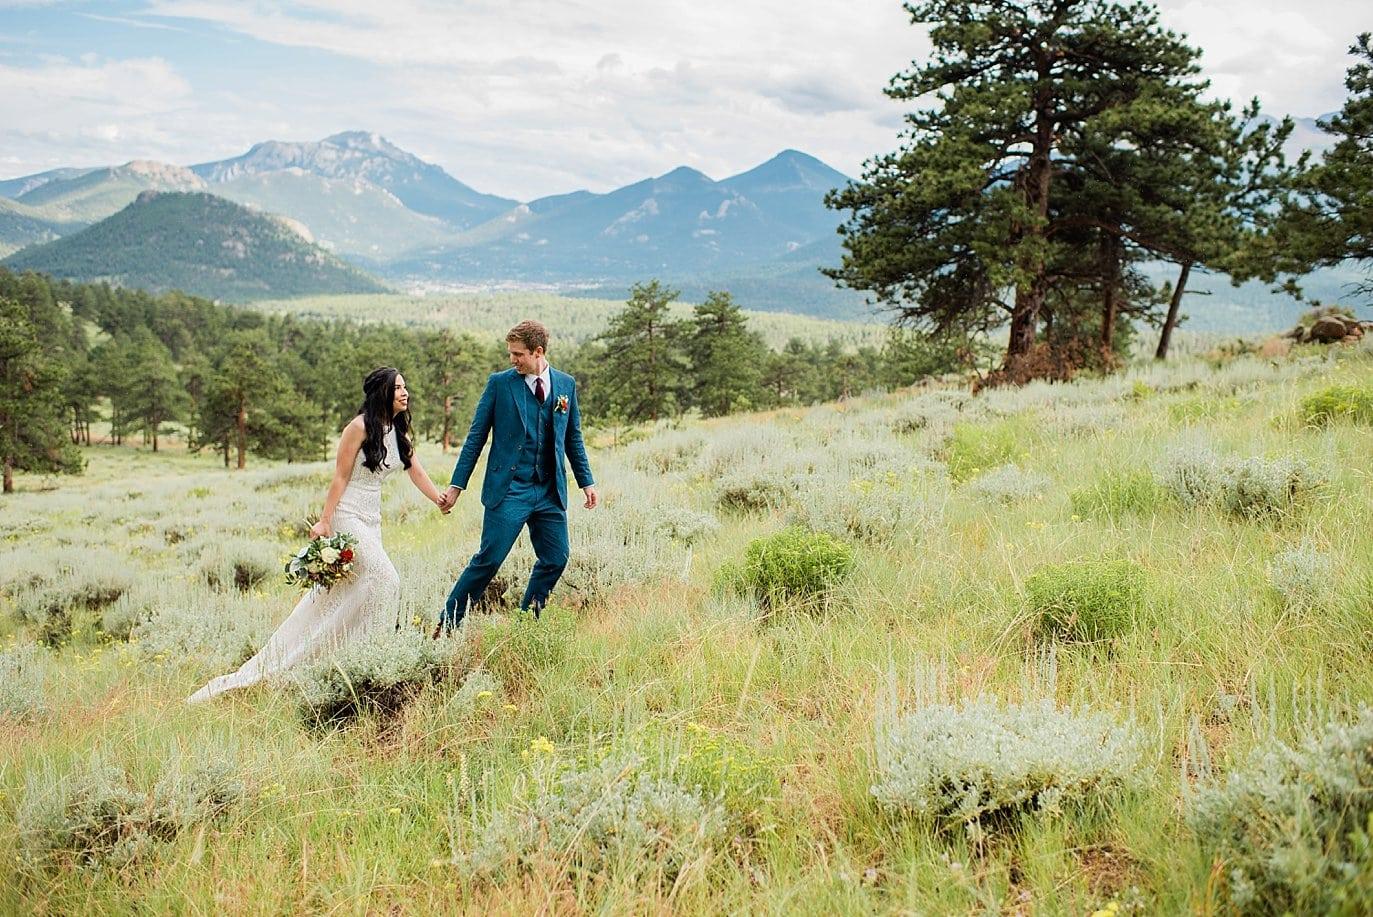 3M Curve wedding at Rocky Mountain National Park Wedding by RMNP Wedding Photographer Jennie Crate